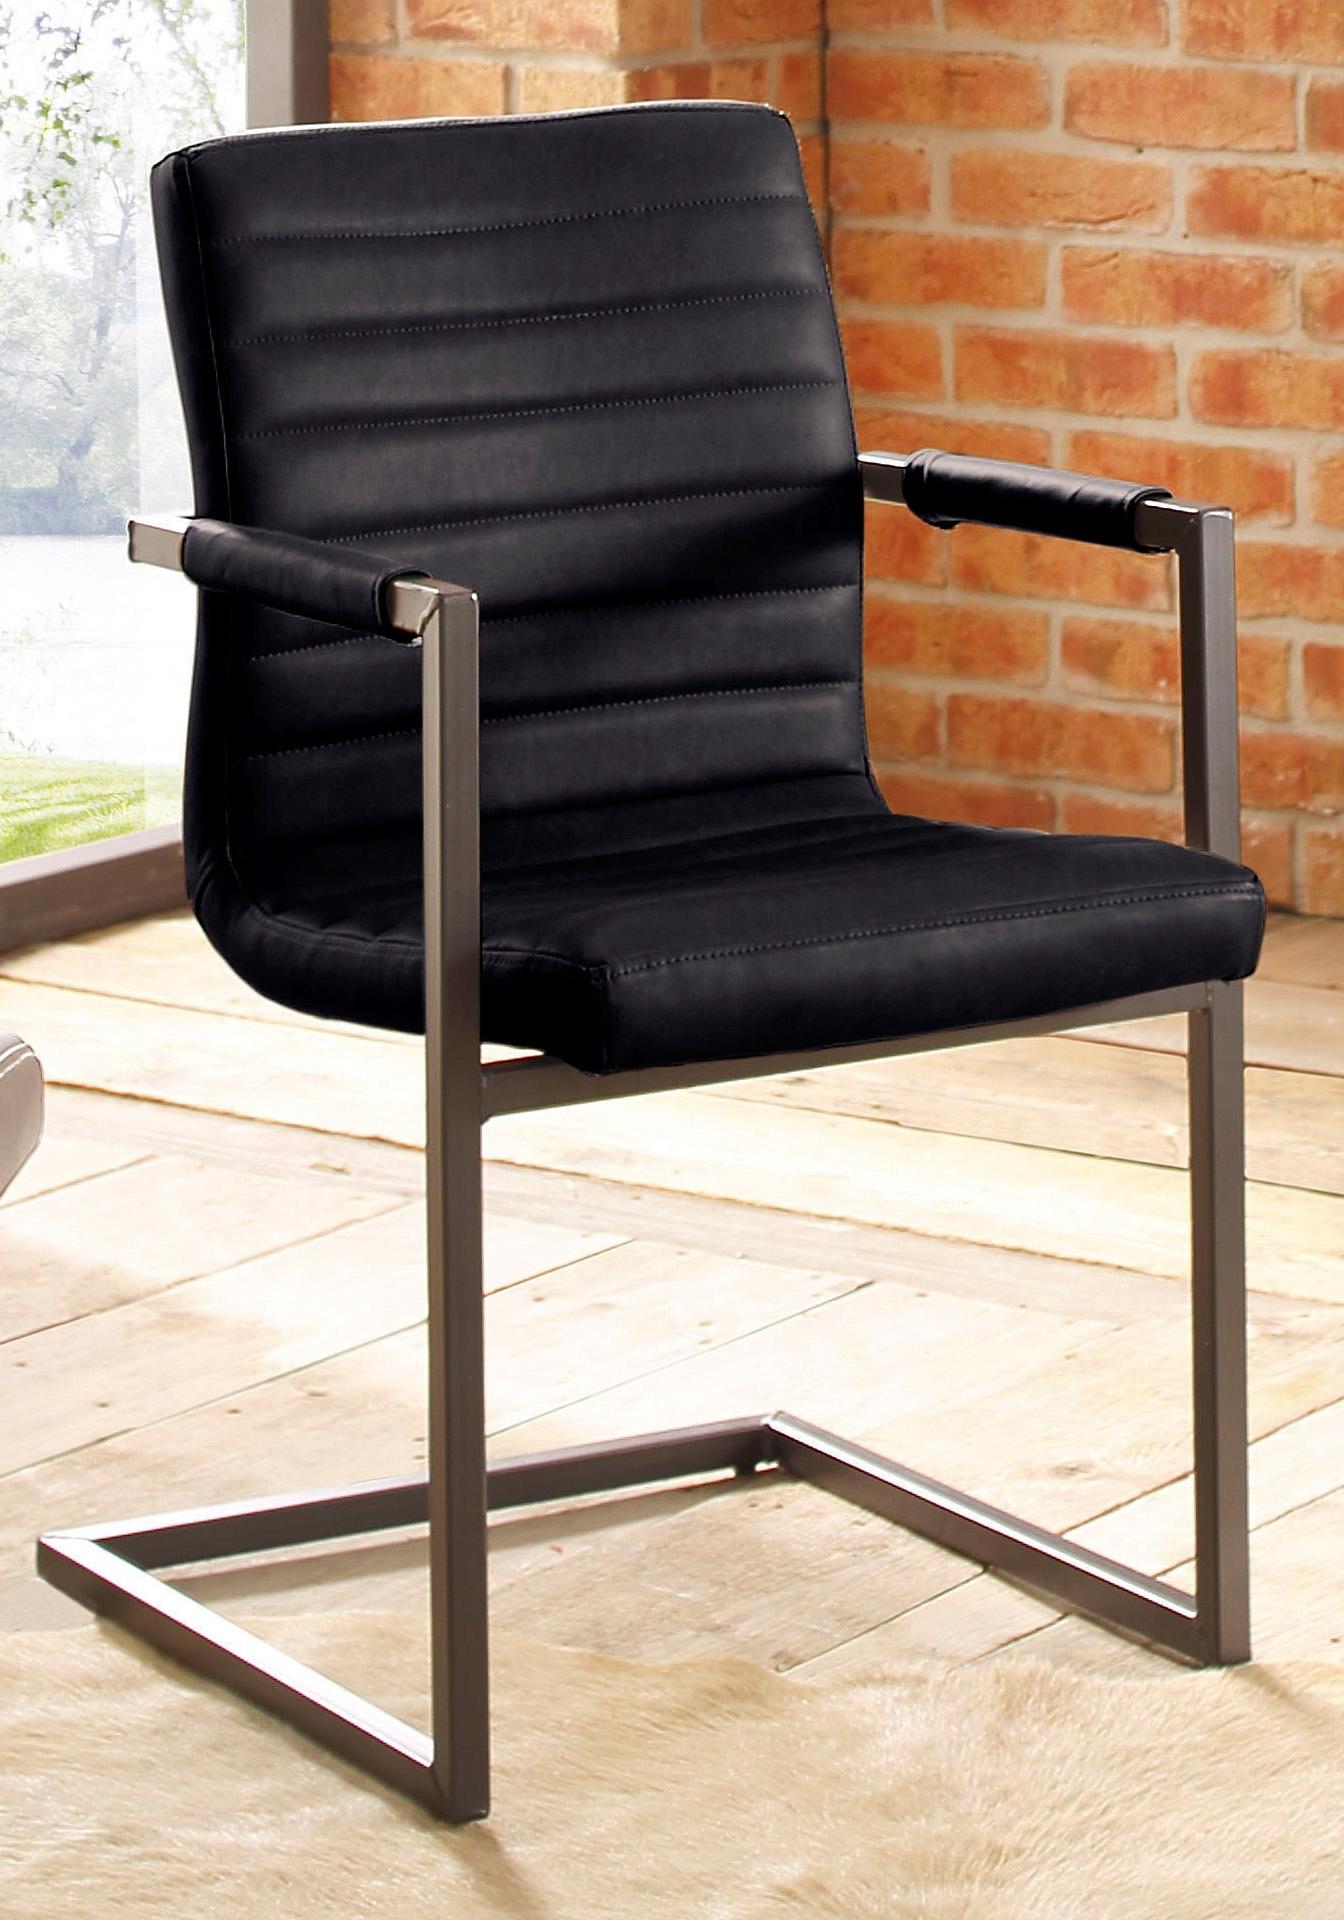 Premium Collection By Home Affaire HOME AFFAIRE Vrijdragende stoel Parzival goedkoop op otto.nl kopen